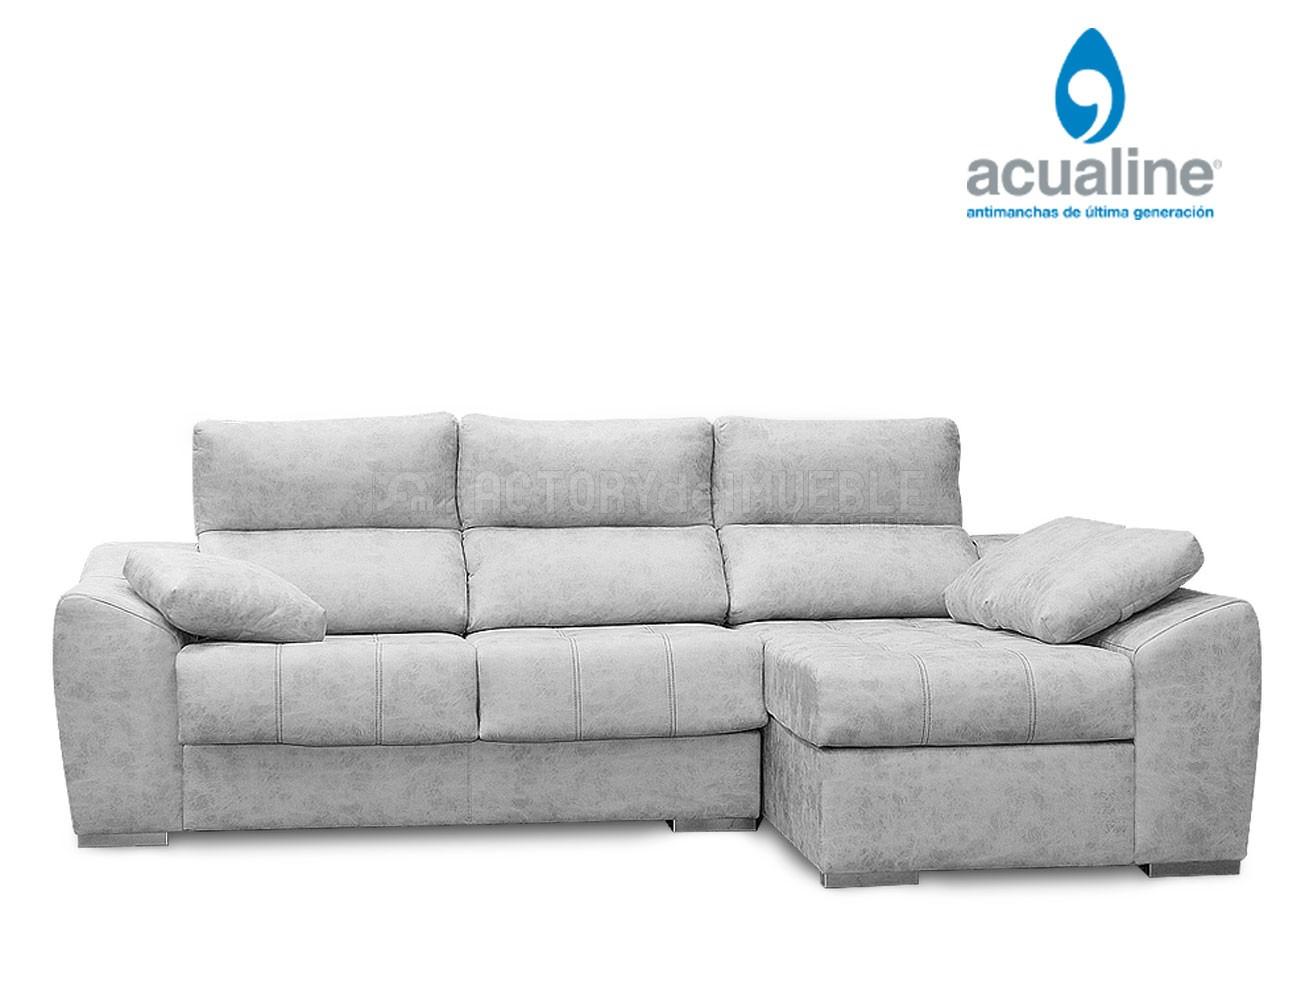 Sofa chaiselongue anti manchas1